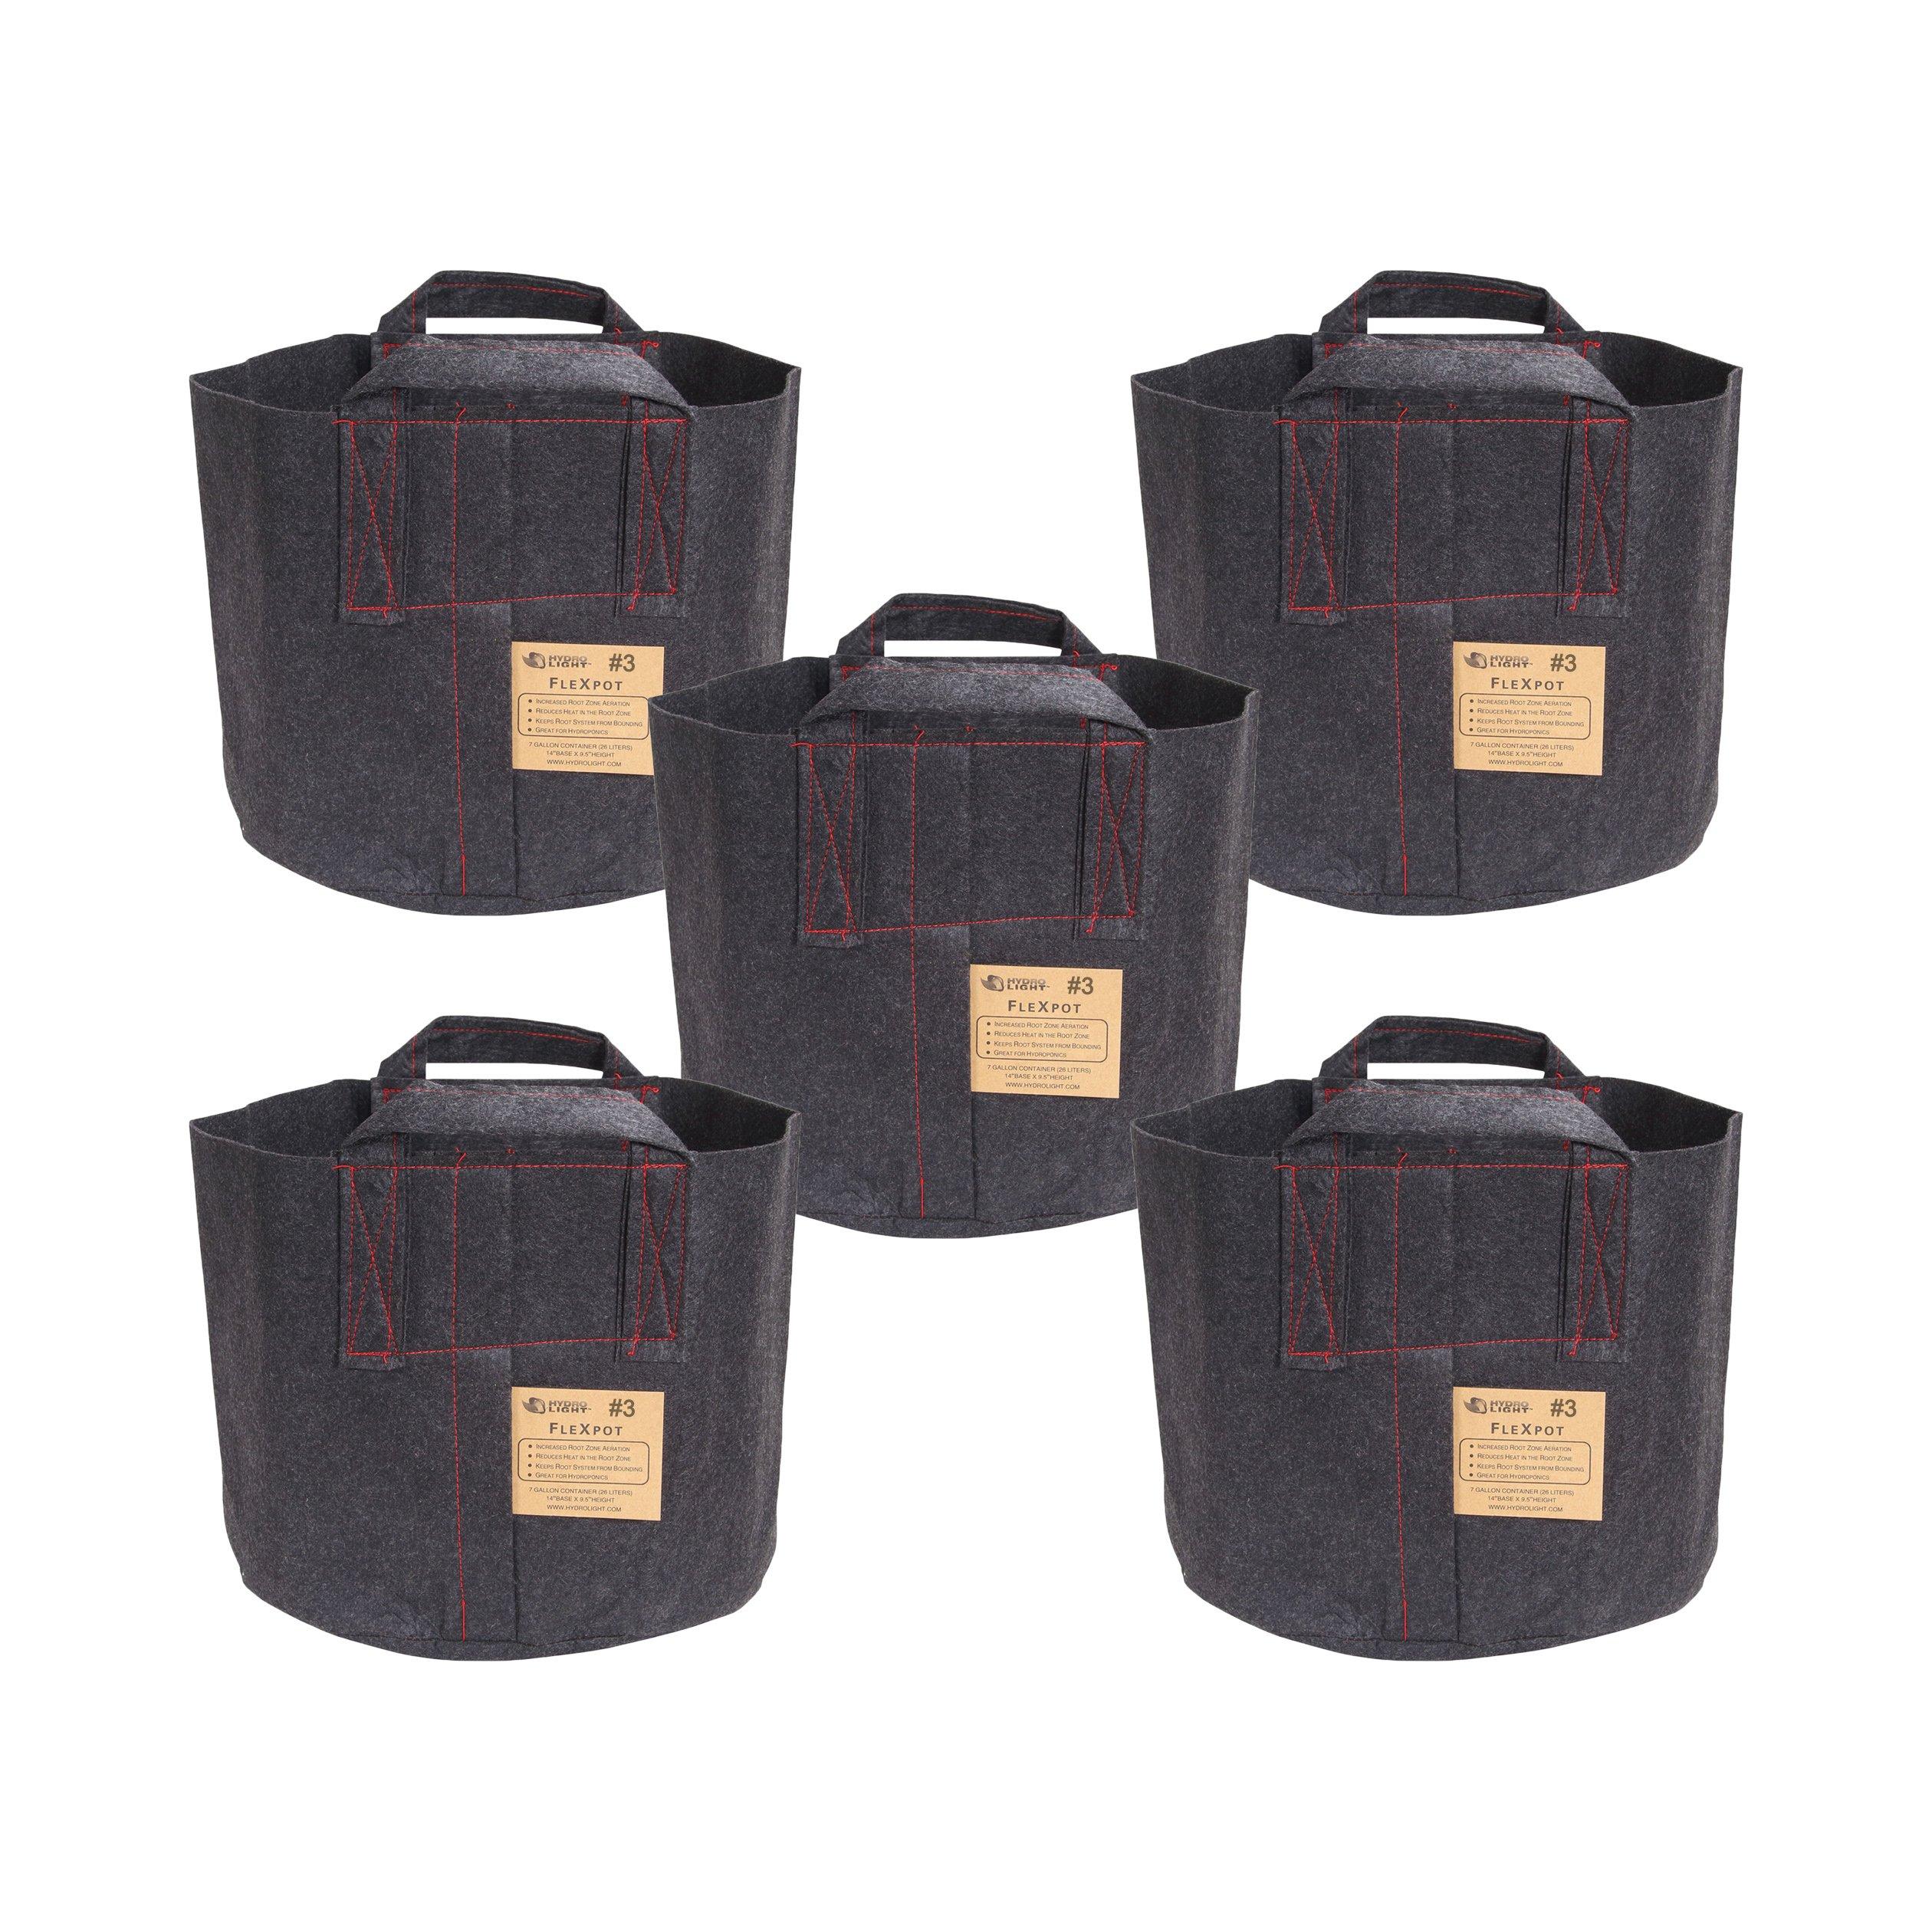 HydroLight Flex Pot, Fabric Grow Pots Smart Gro Sacks Breathable Pots Planters (5, 3 Gallon Pot)